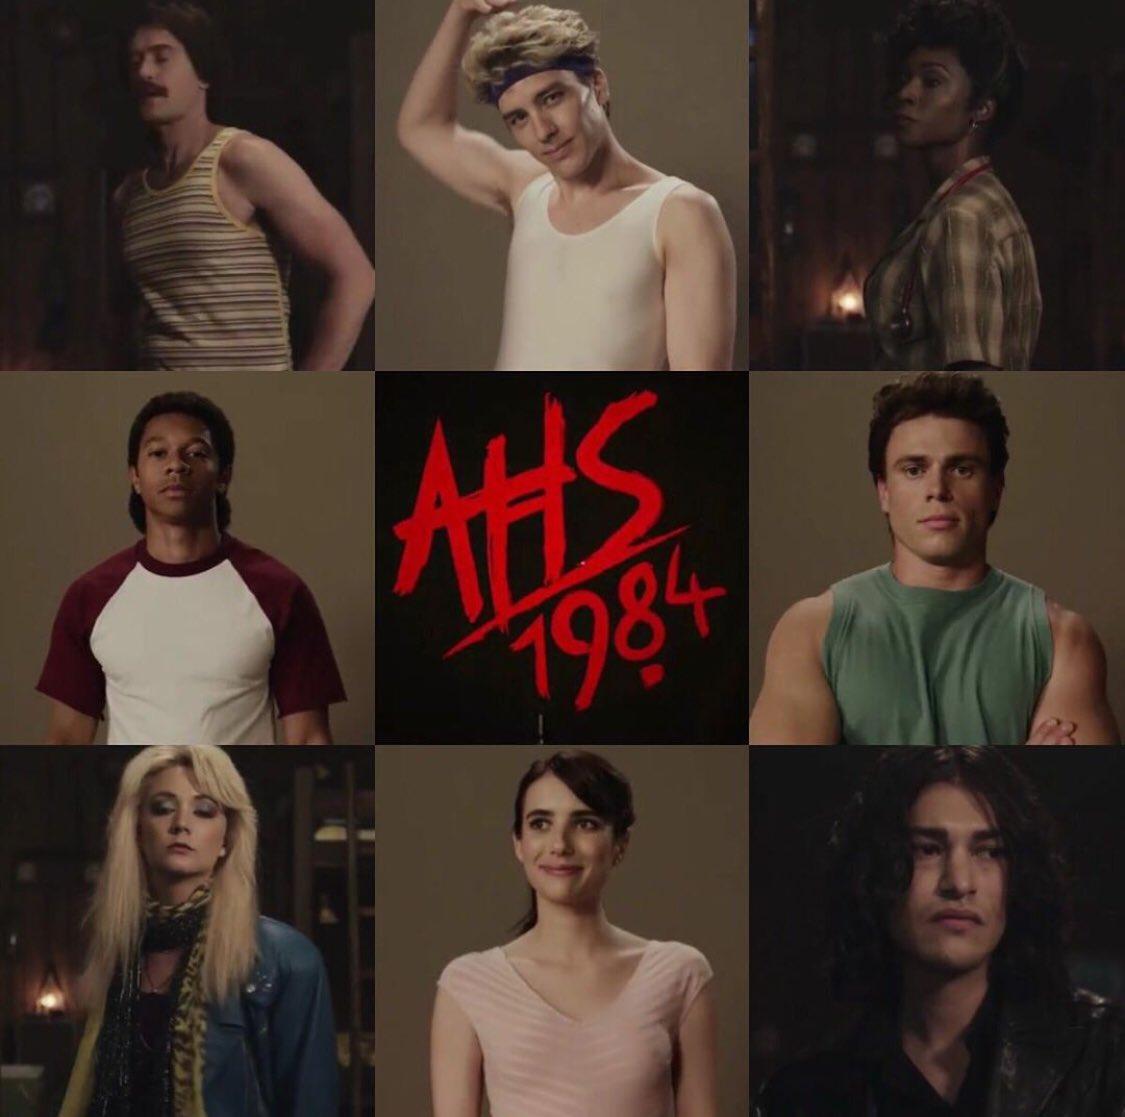 "¡Con ustedes el cast oficial de ""AHS: 1984""! Emma Roberts, Gus Kenworthy, Billie Lourd, Cody Fern, Leslie Grossman, Matthew Morrison y John Carroll Lynch. <br>http://pic.twitter.com/6sehECkiKh"